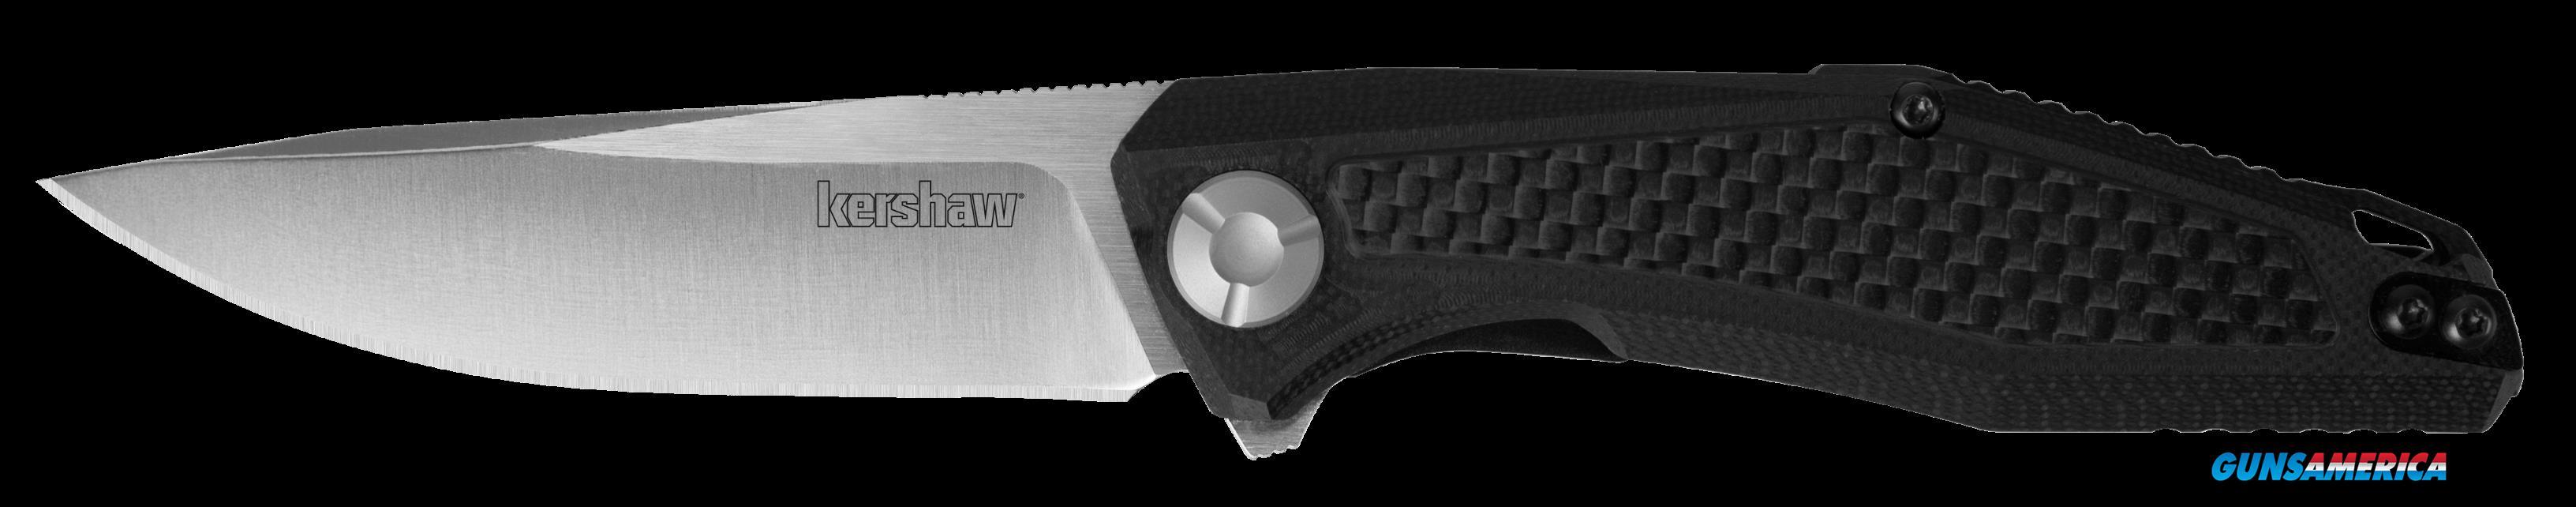 Kershaw Atmos, Ker 4037        Atmos G10-cf Overlay  Guns > Pistols > 1911 Pistol Copies (non-Colt)